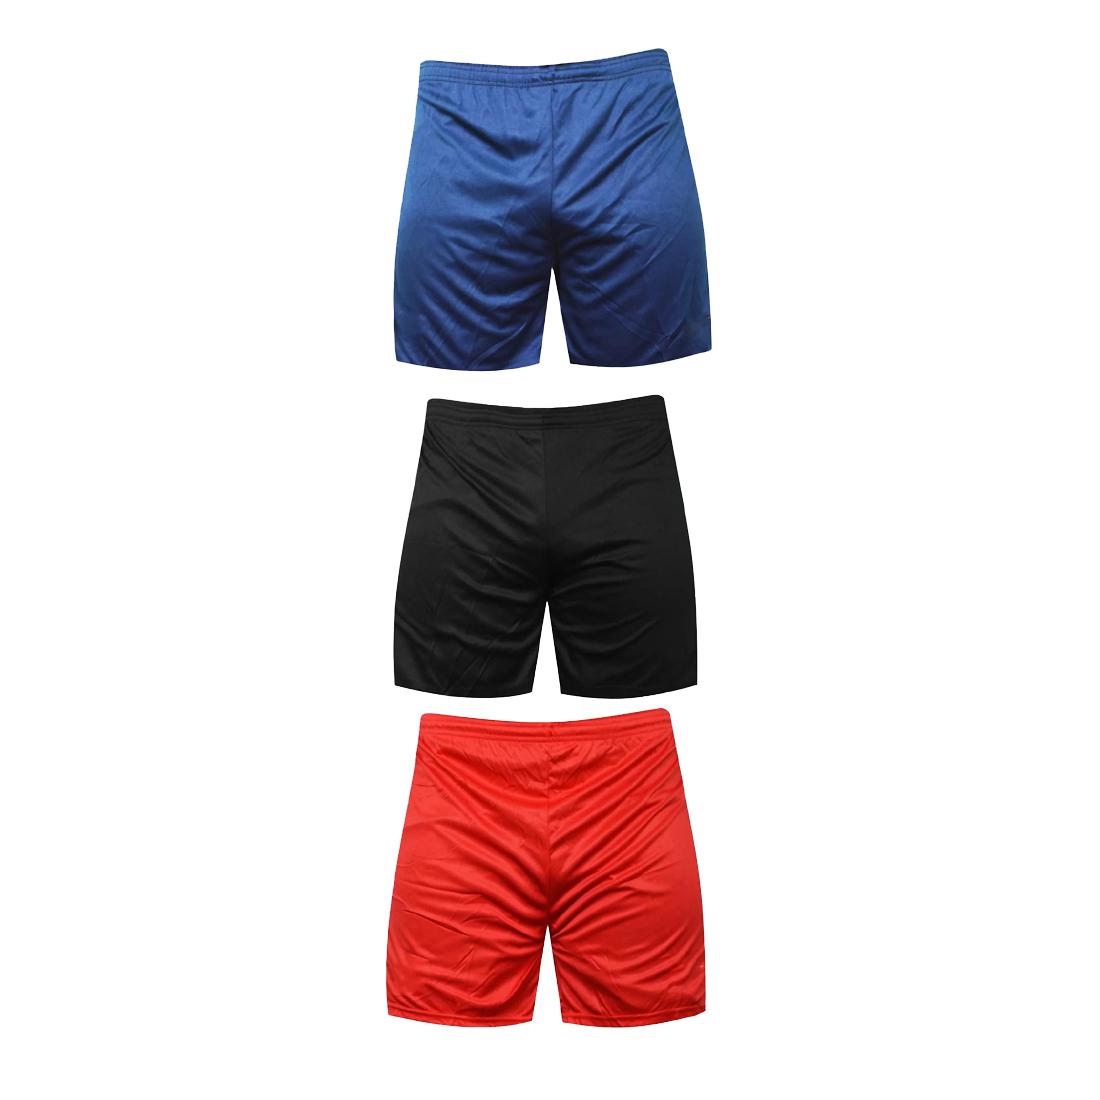 Mj Store Present Polyster Dry Fit Men's Lounge, Beach, Bermuda, Casual, Sports, Night wear, Cycling, Short rd blu bl